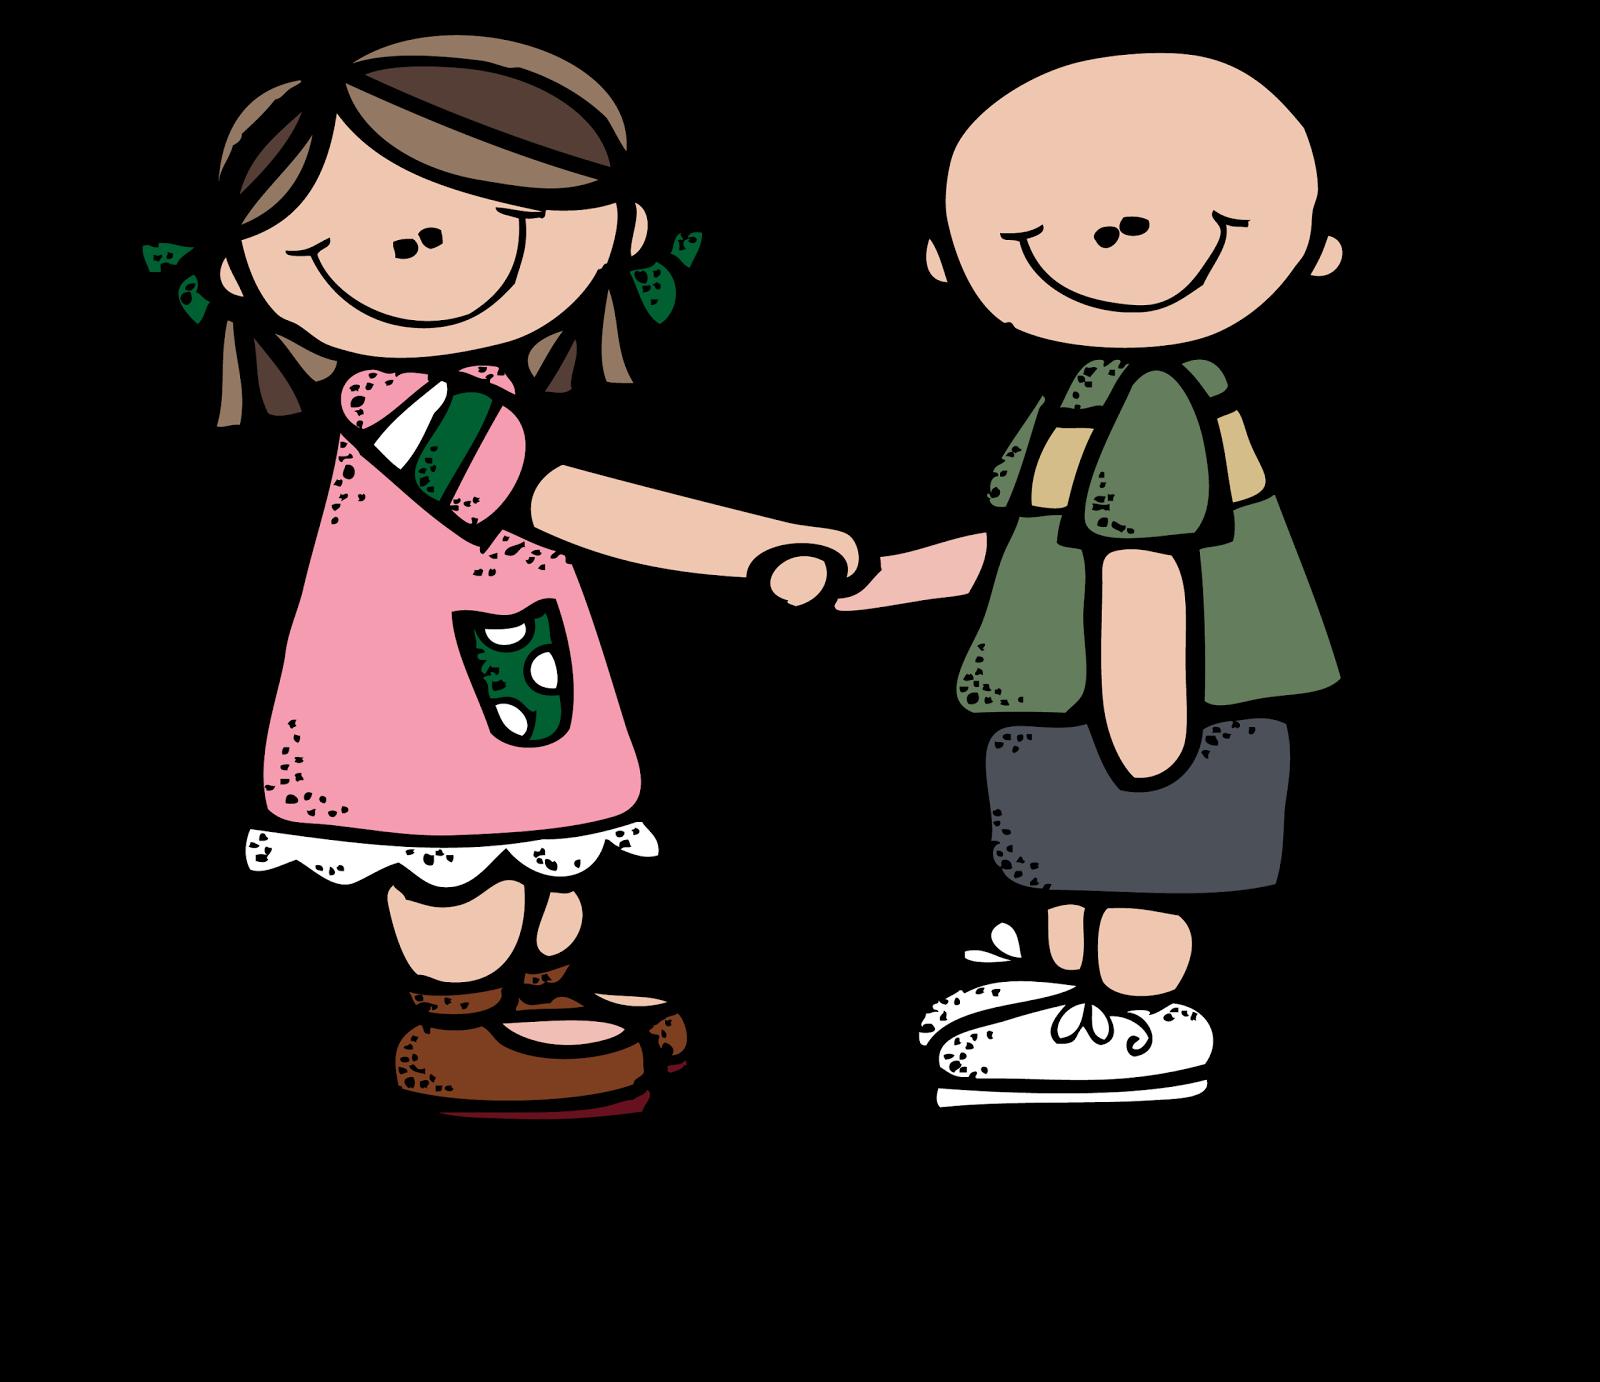 kindness clipart pleasant person